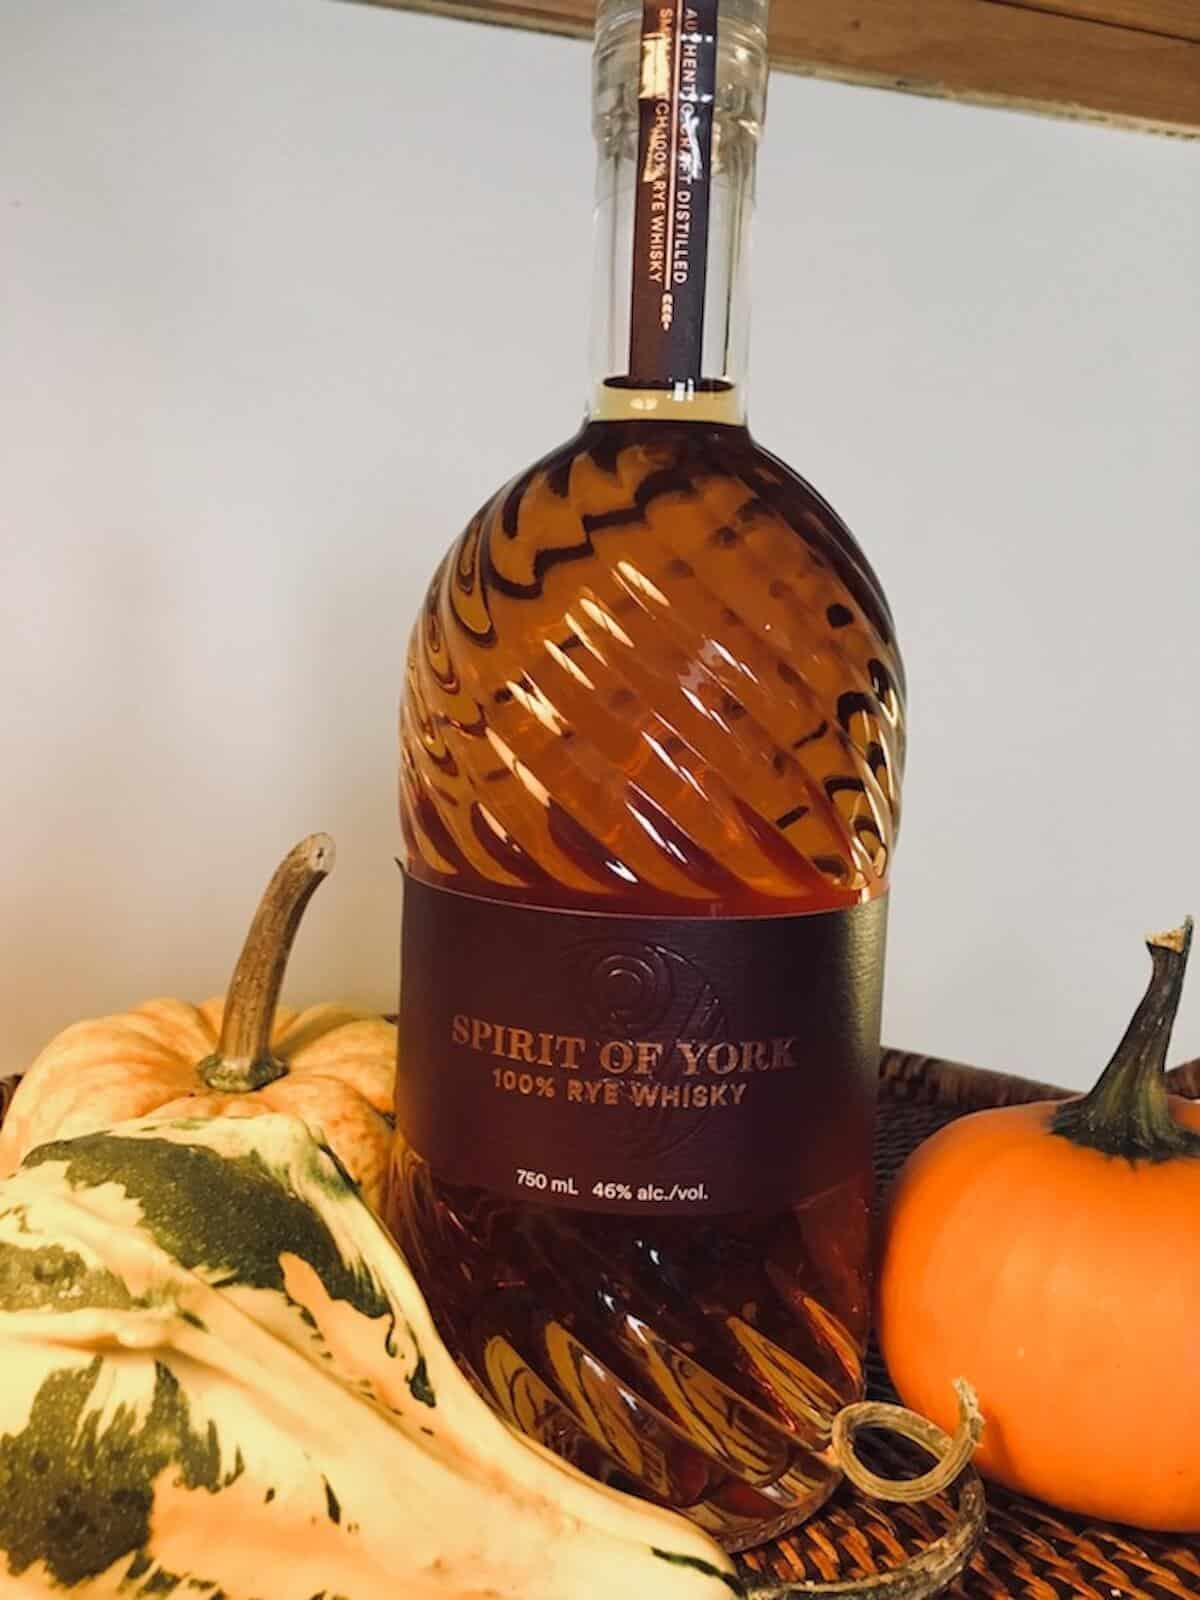 Spirit of York rye whisky bottle surrounded by gourds on a wood tray.Spirit of York rye whisky bottle surrounded by gourds on a wood tray.